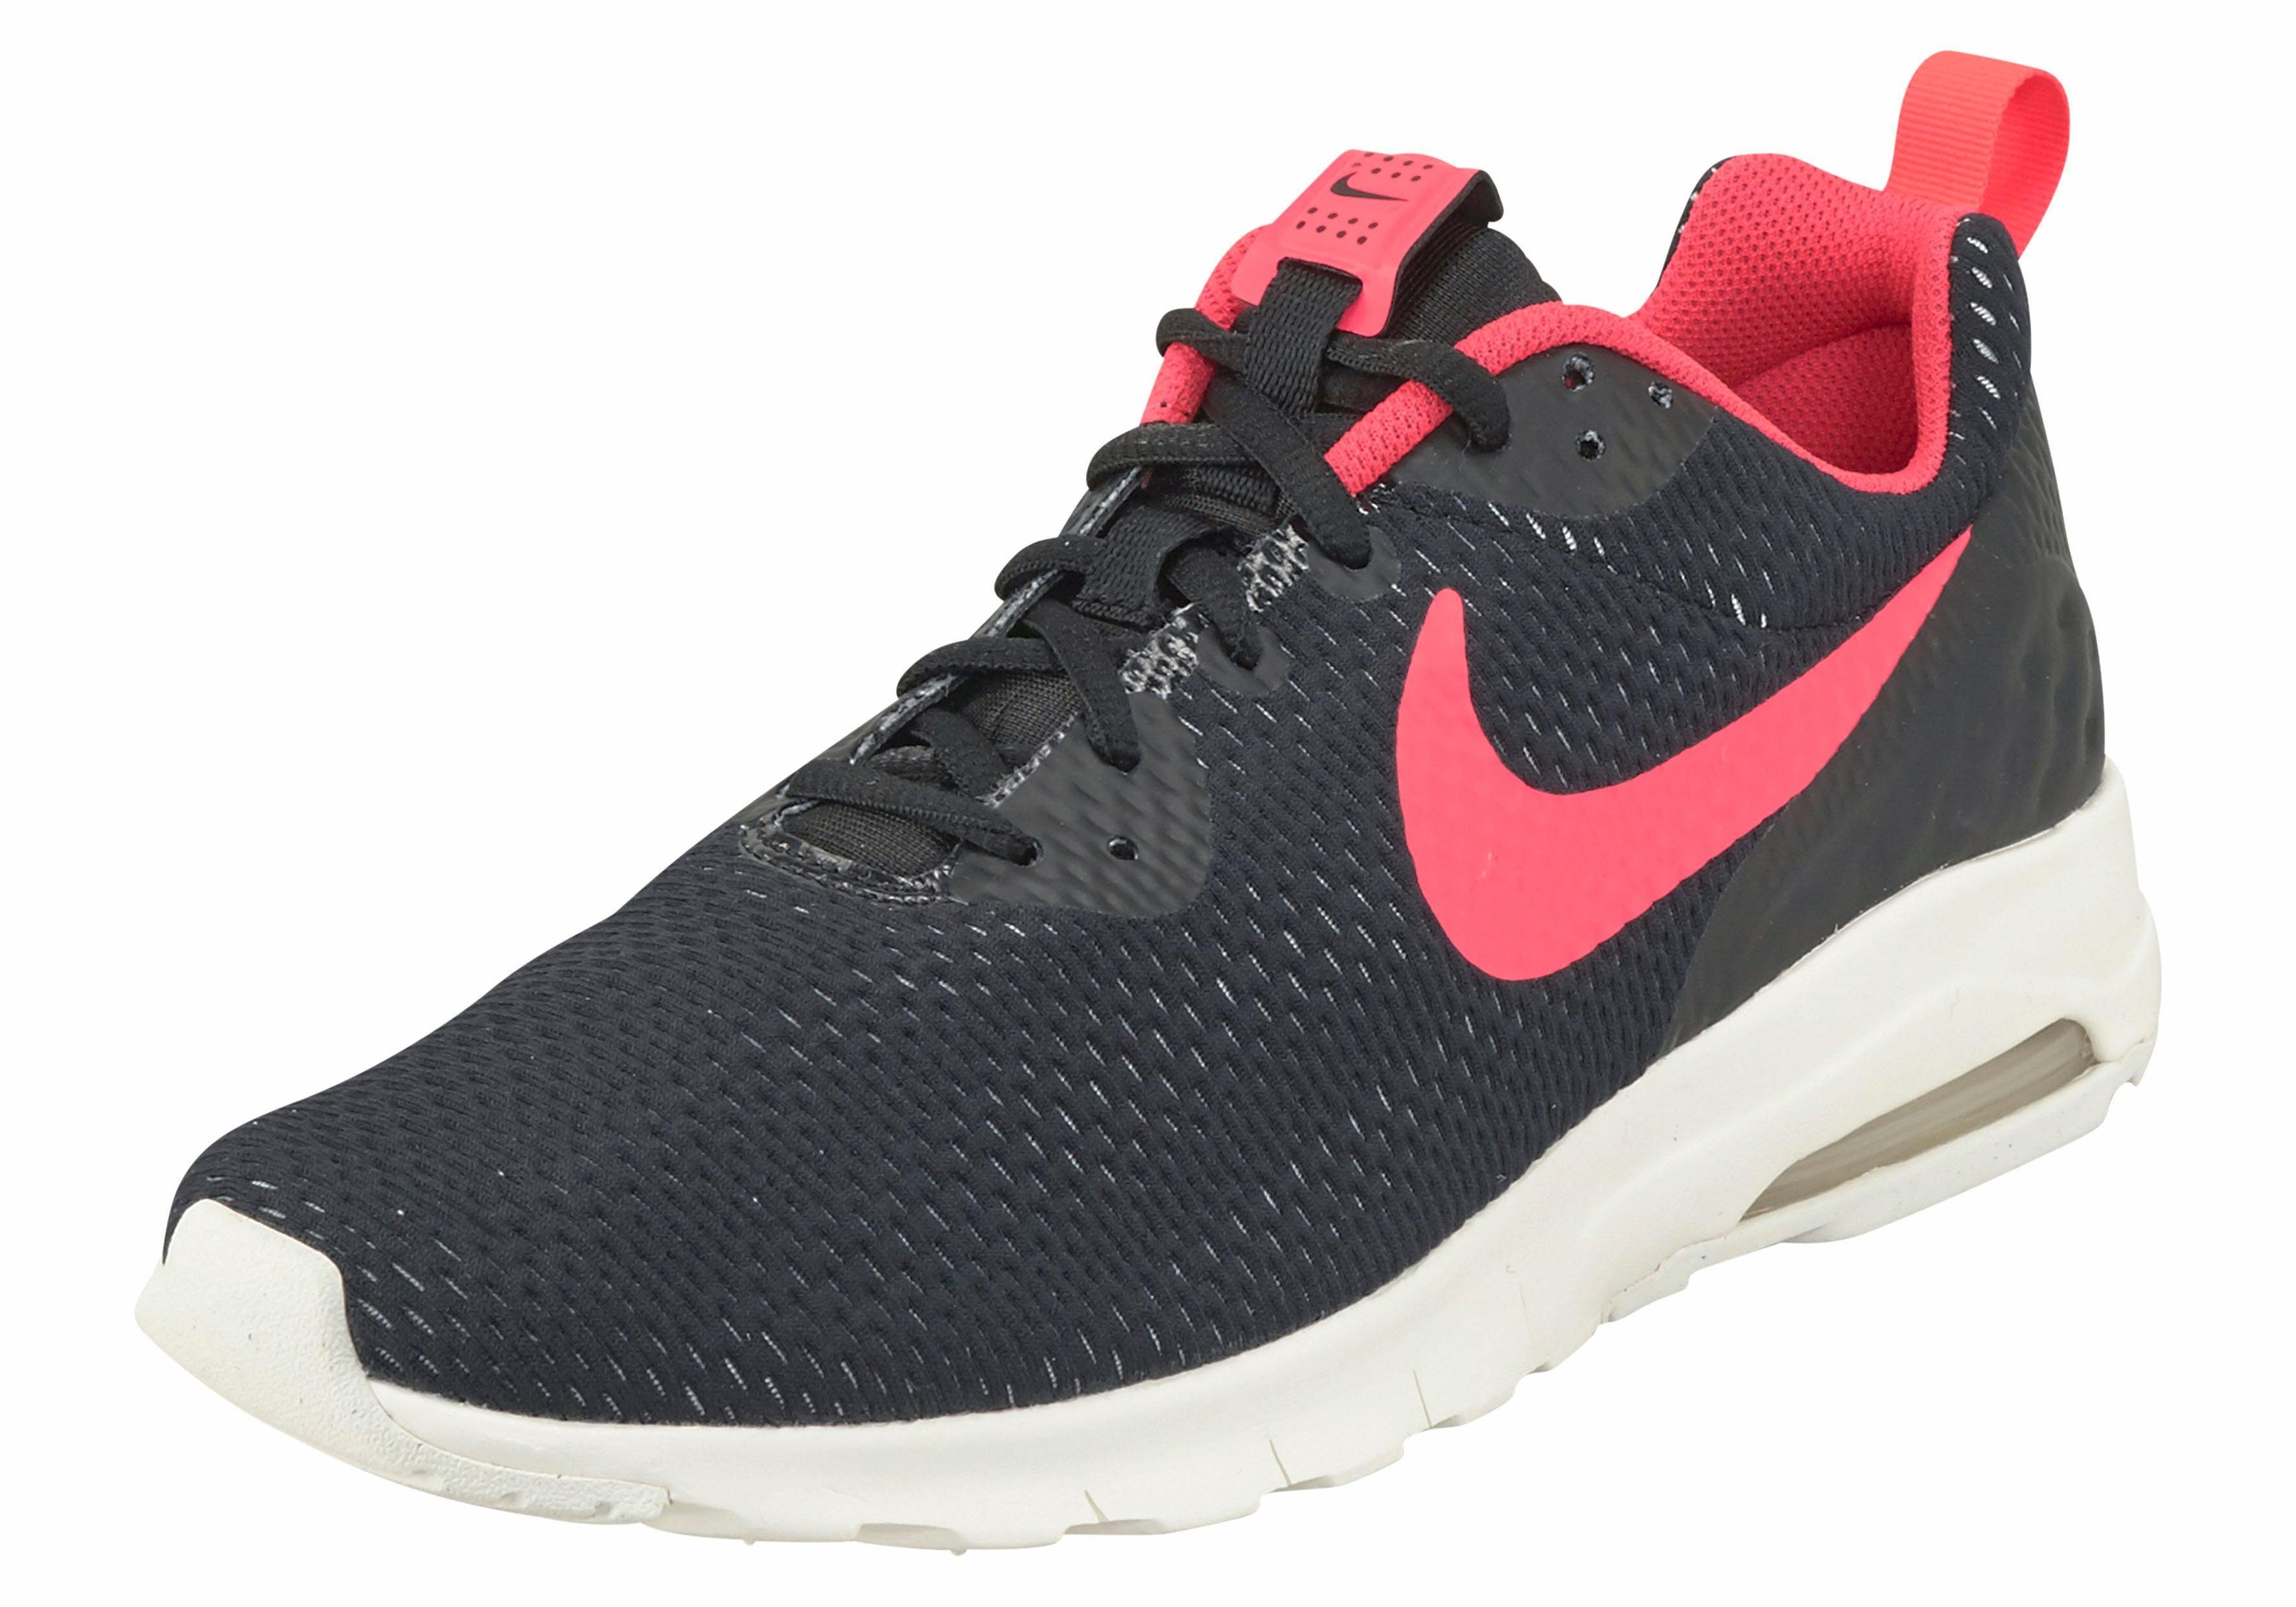 Nike Chaussures De Sport Bas